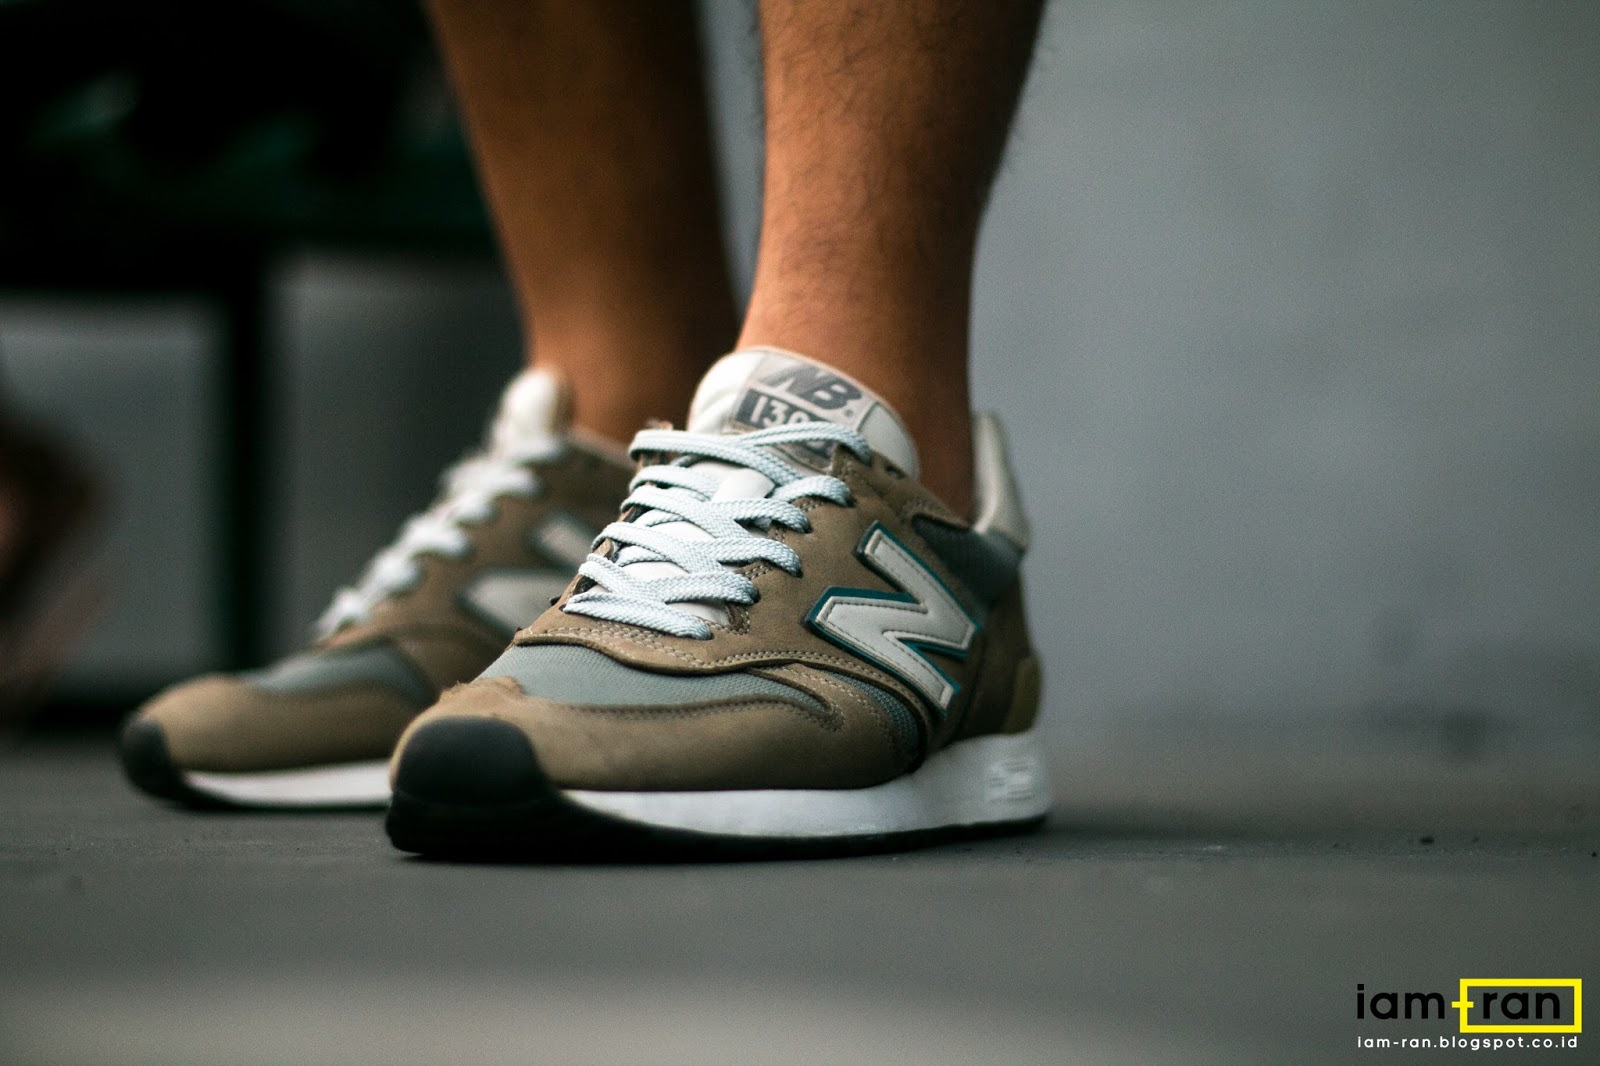 44bdc7d9c10e15 ... Photo by iam.ran06 hot product 97496 7b0e8  Anggie Raditya on feet.  Sneakers Nike SB Dunk Low ...